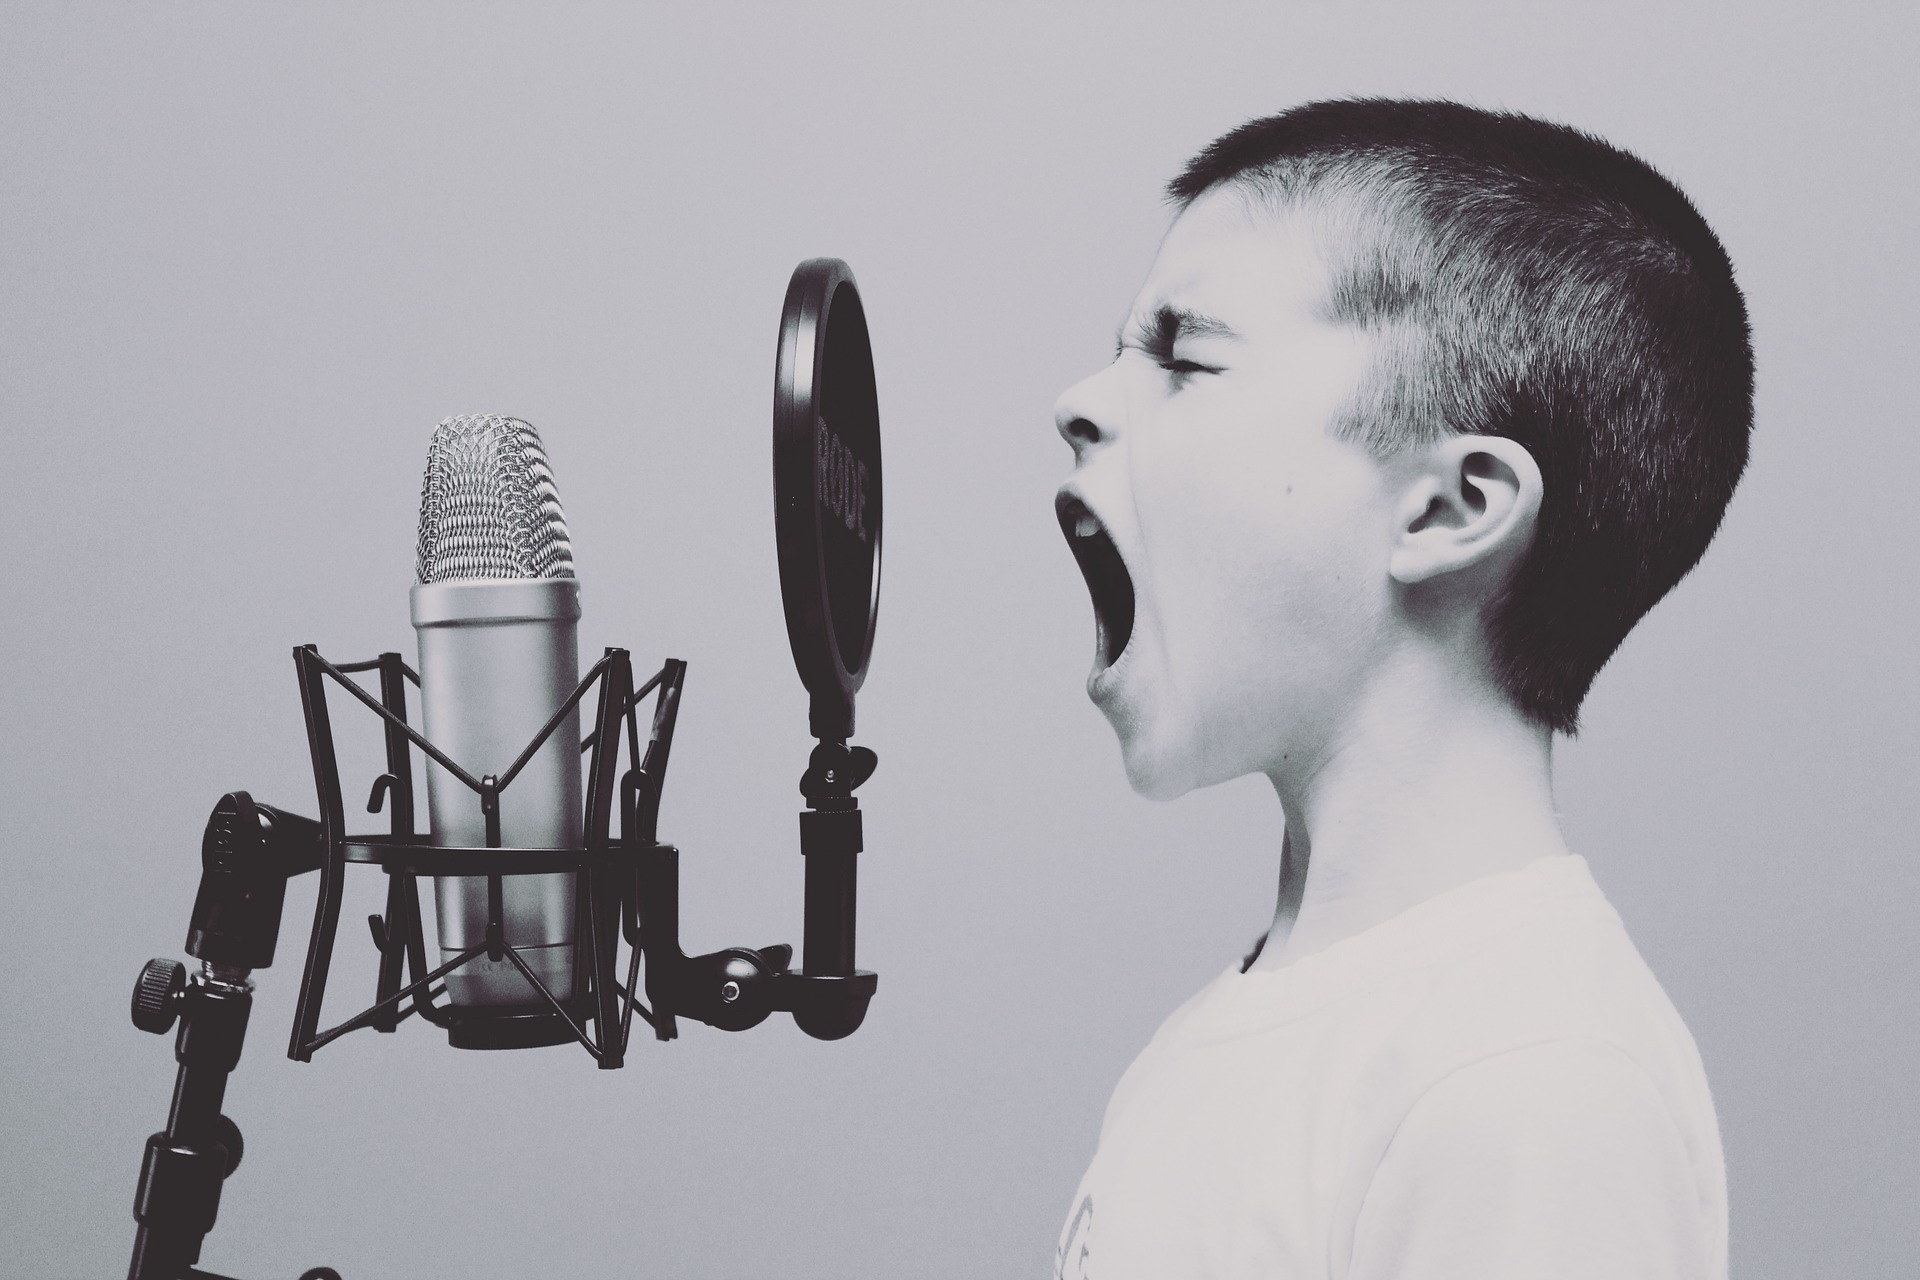 La Musique Libre